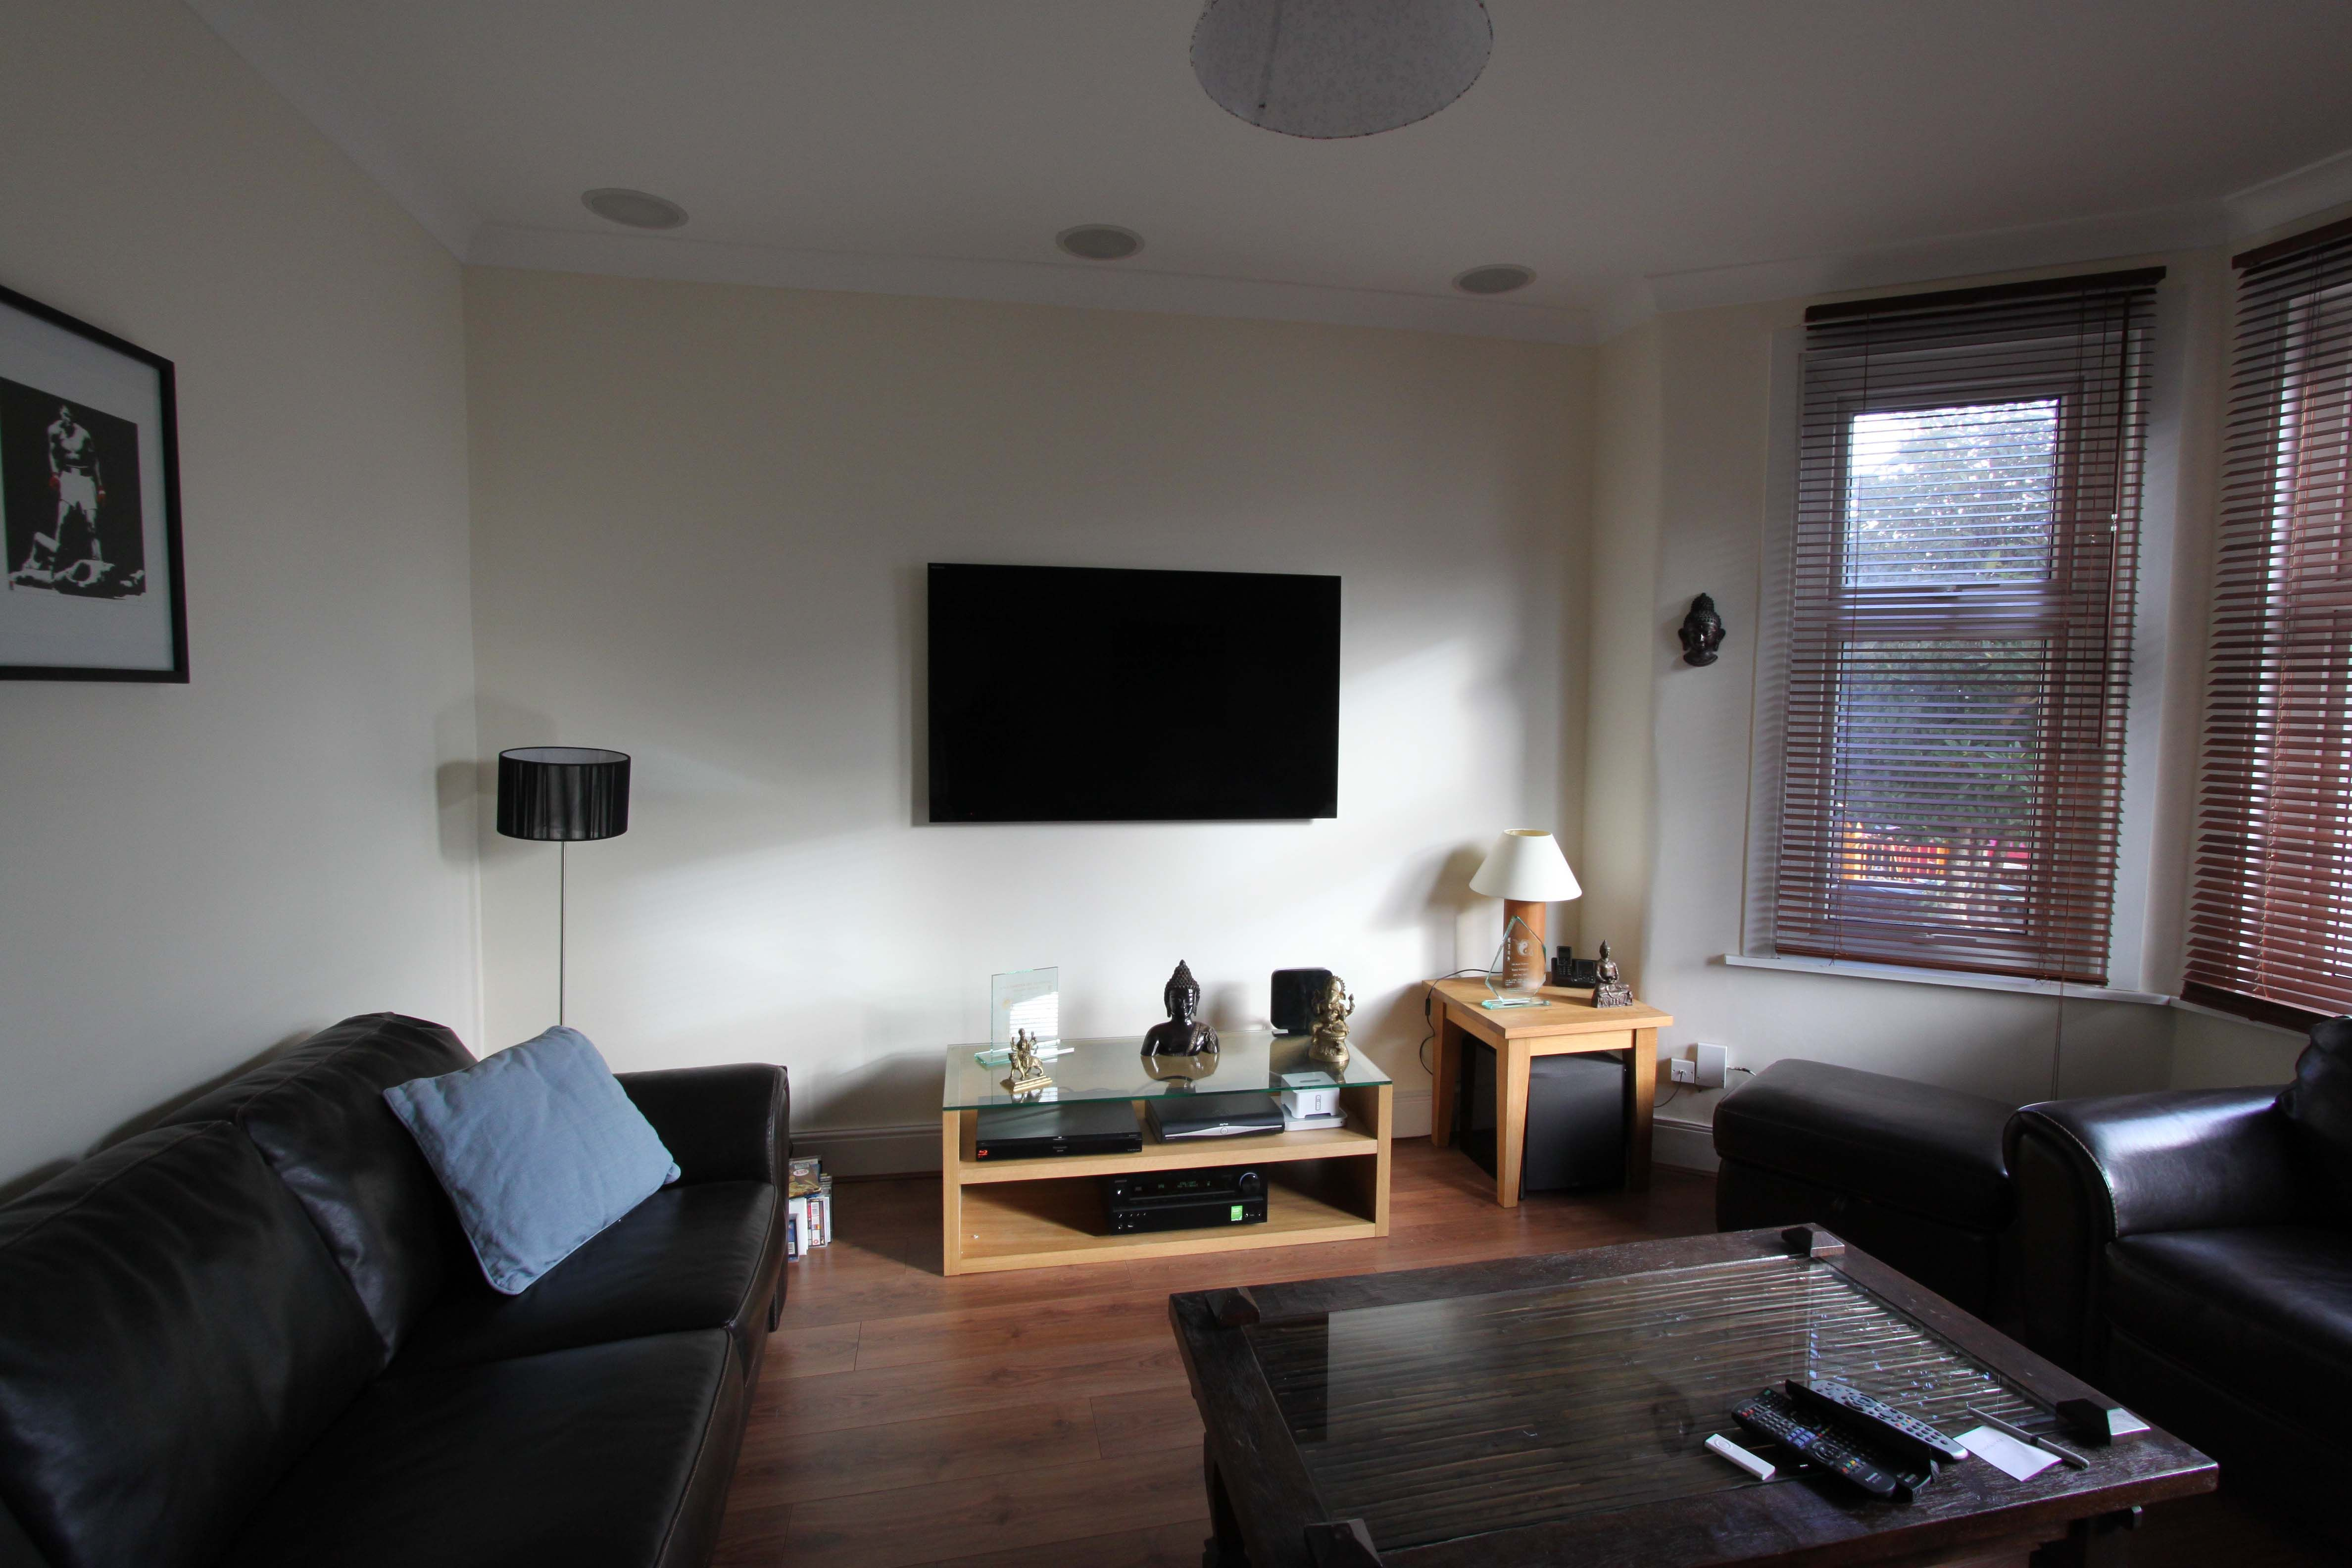 51 Speaker Placement Ceiling